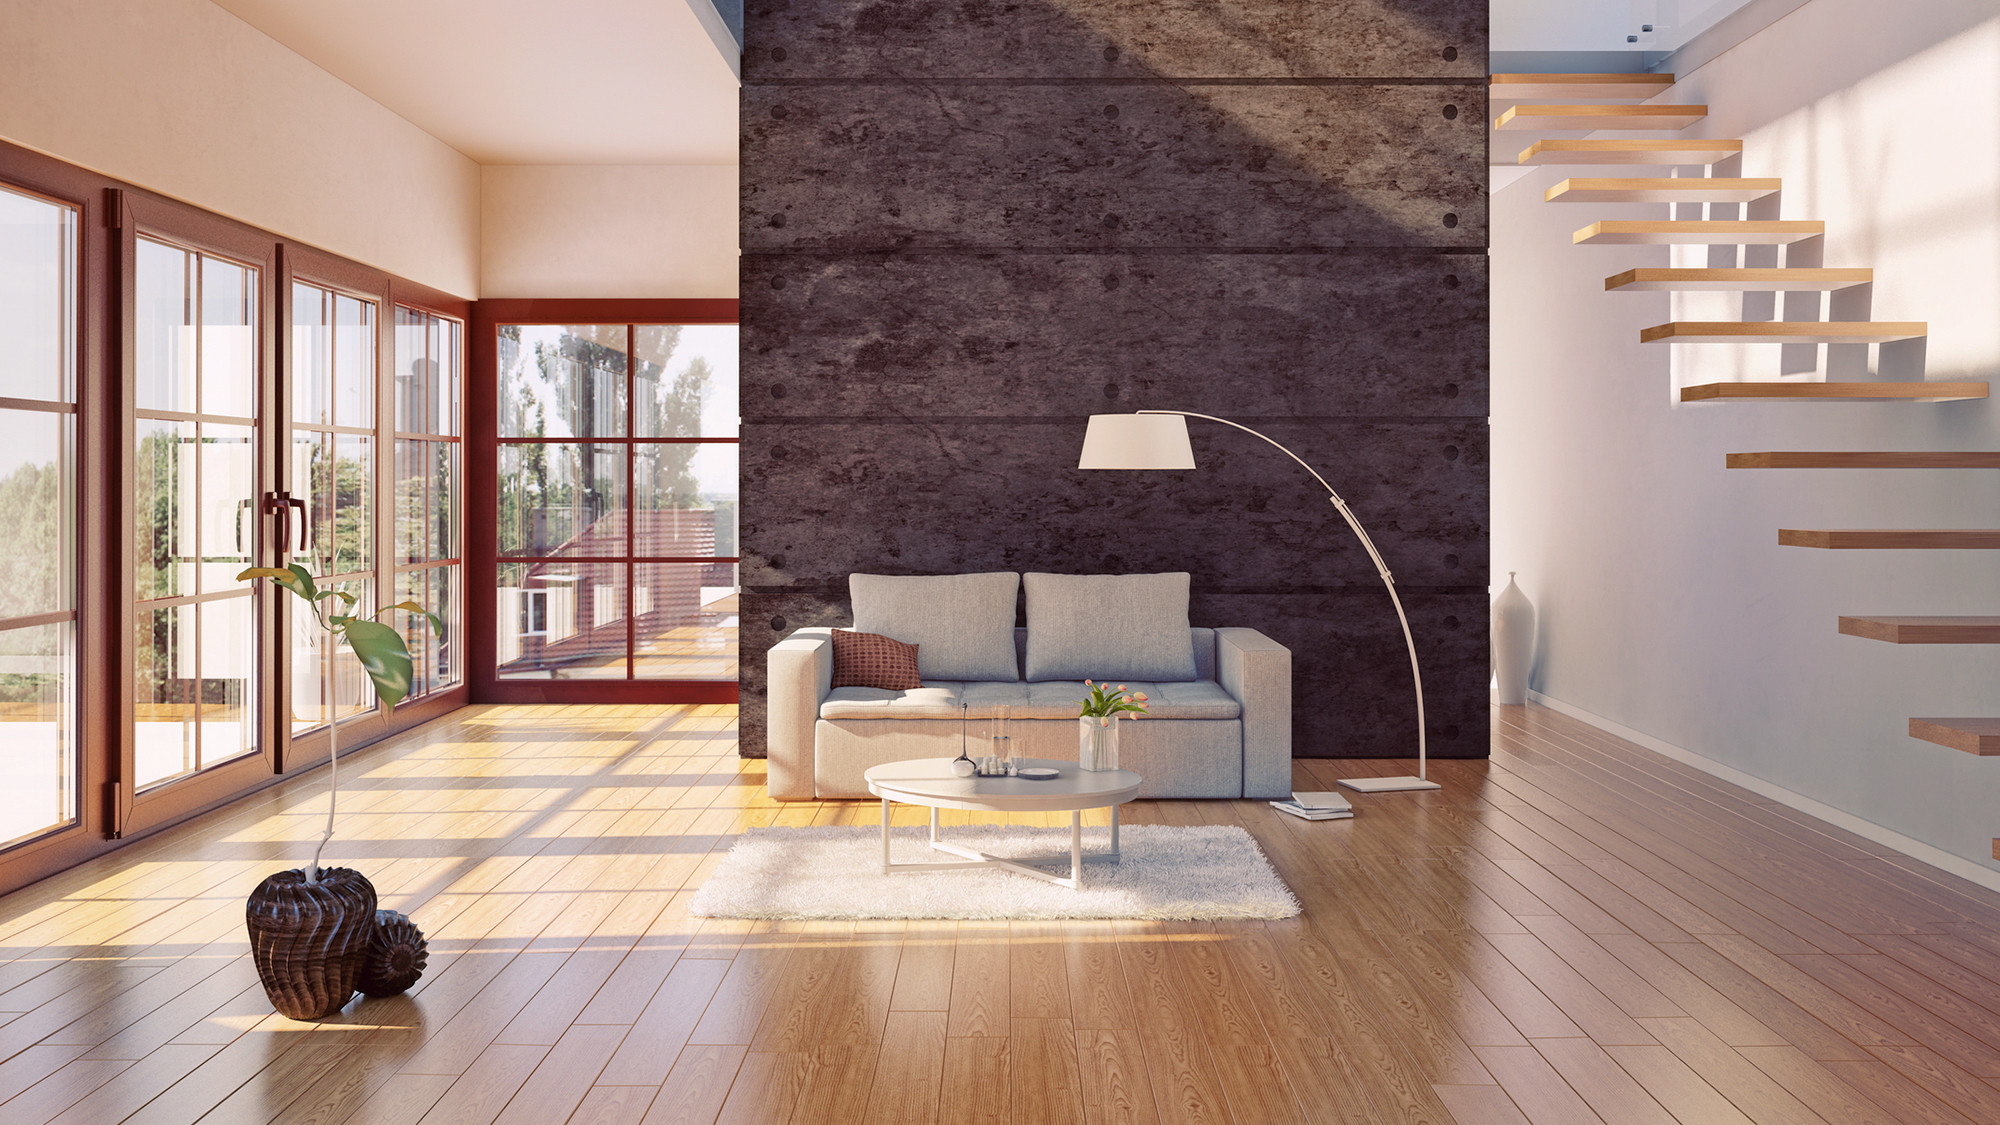 Hardwood Floor Ideas Styles Of Do Hardwood Floors Provide the Best Return On Investment Realtor Coma Pertaining to Hardwood Floors Investment